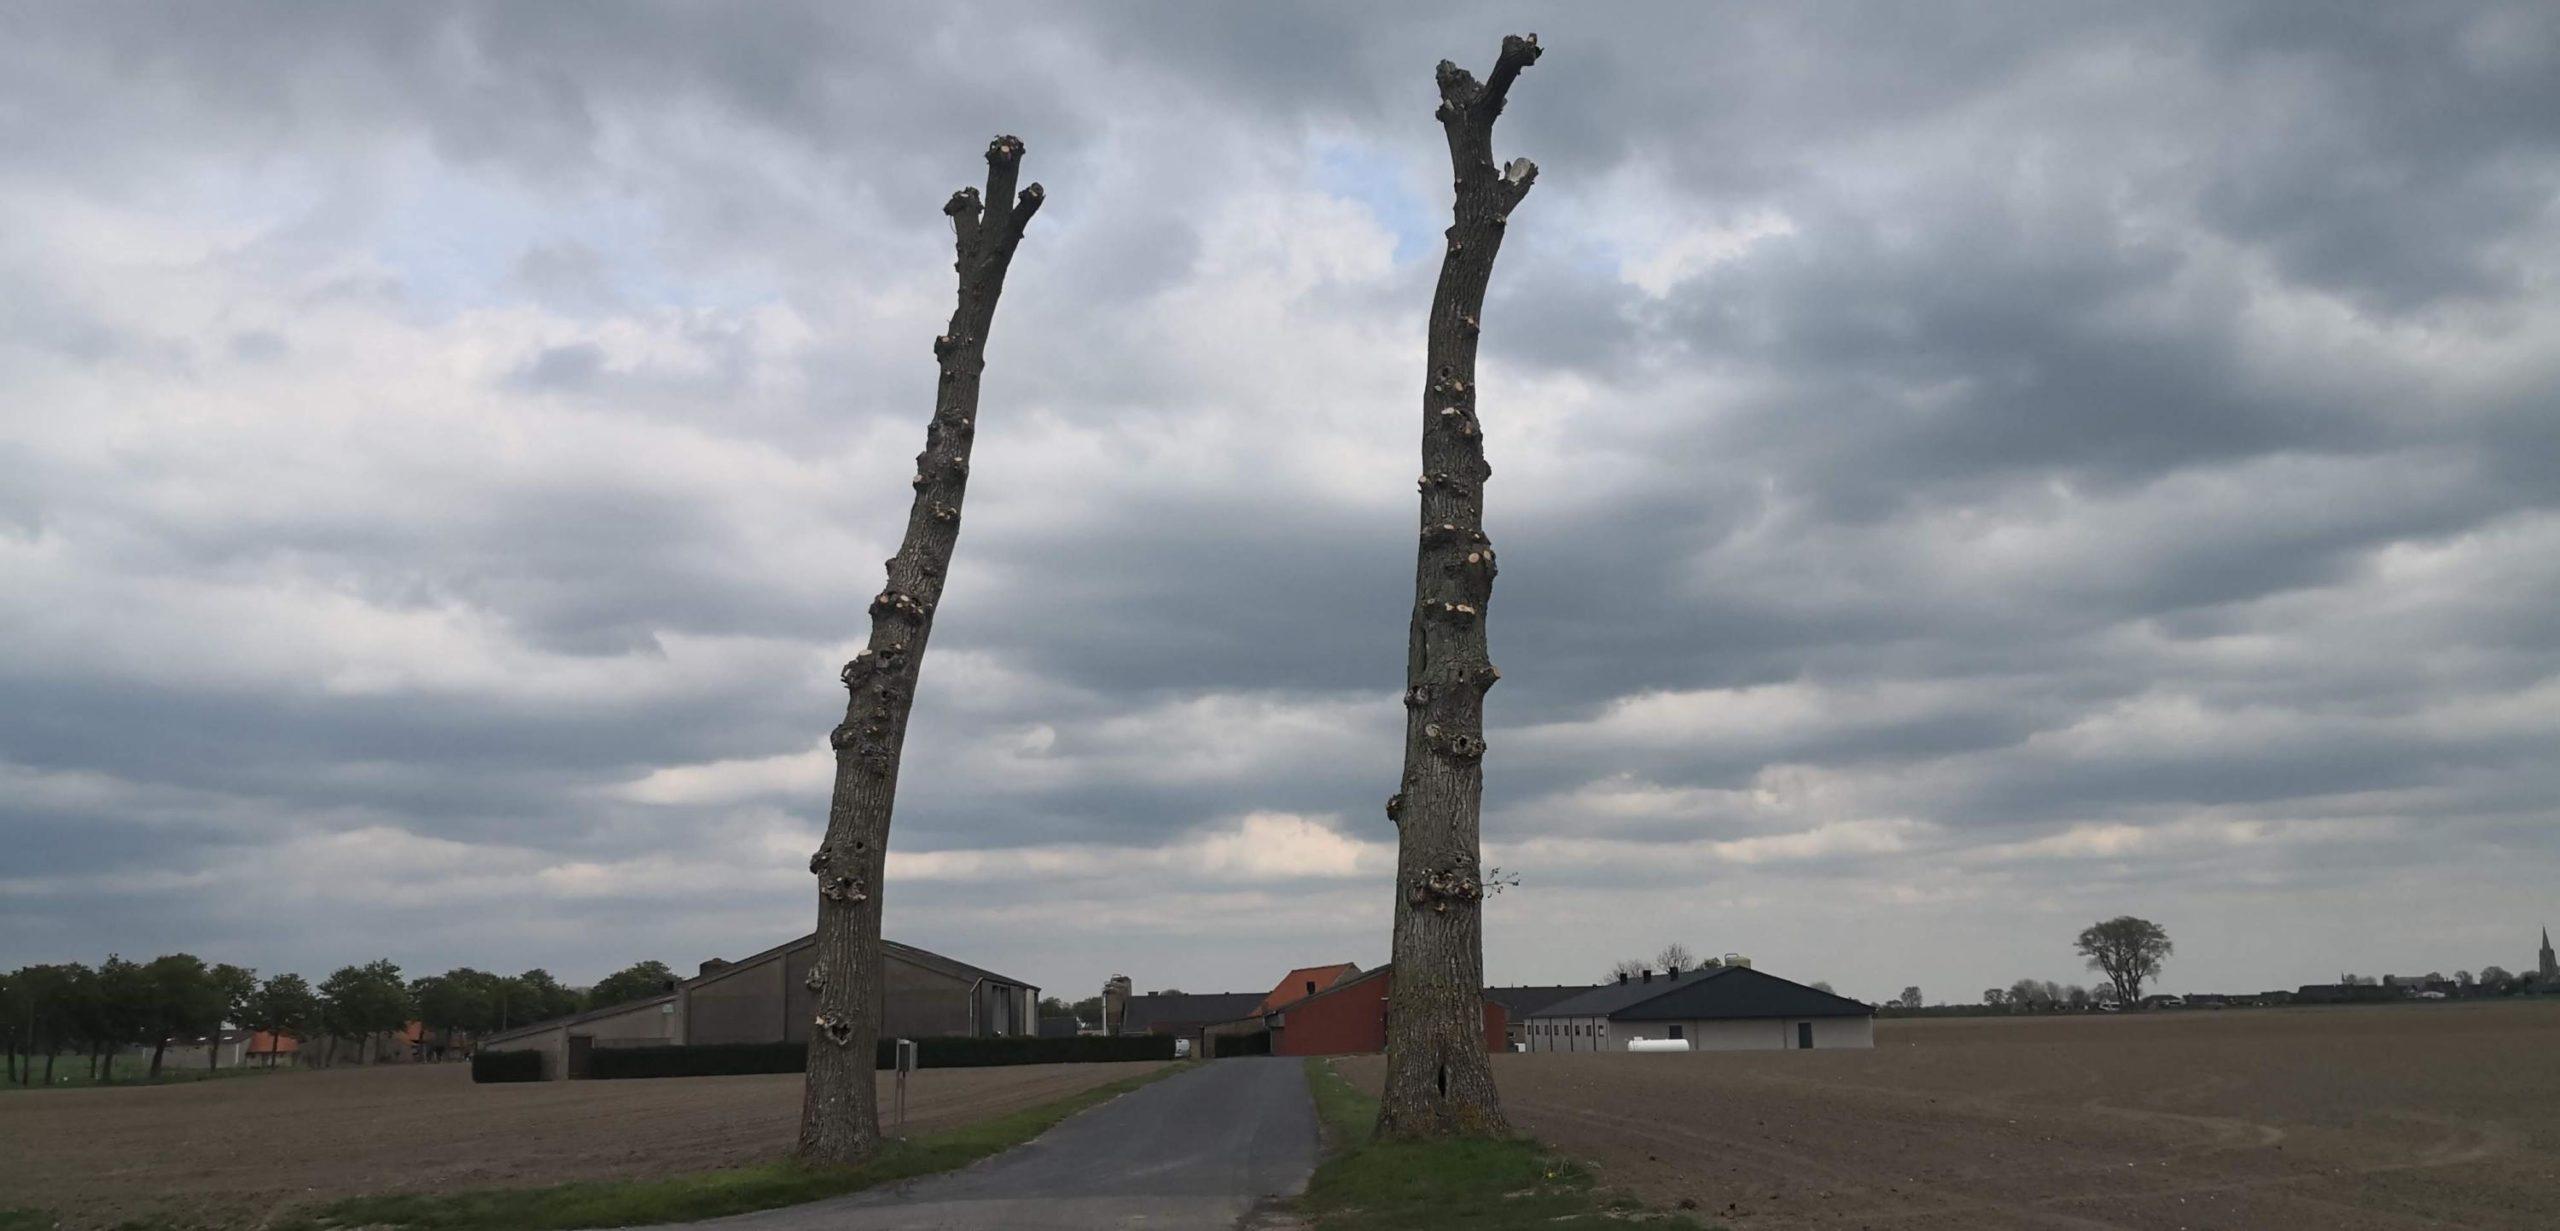 Pollinkhove arbres sinistres